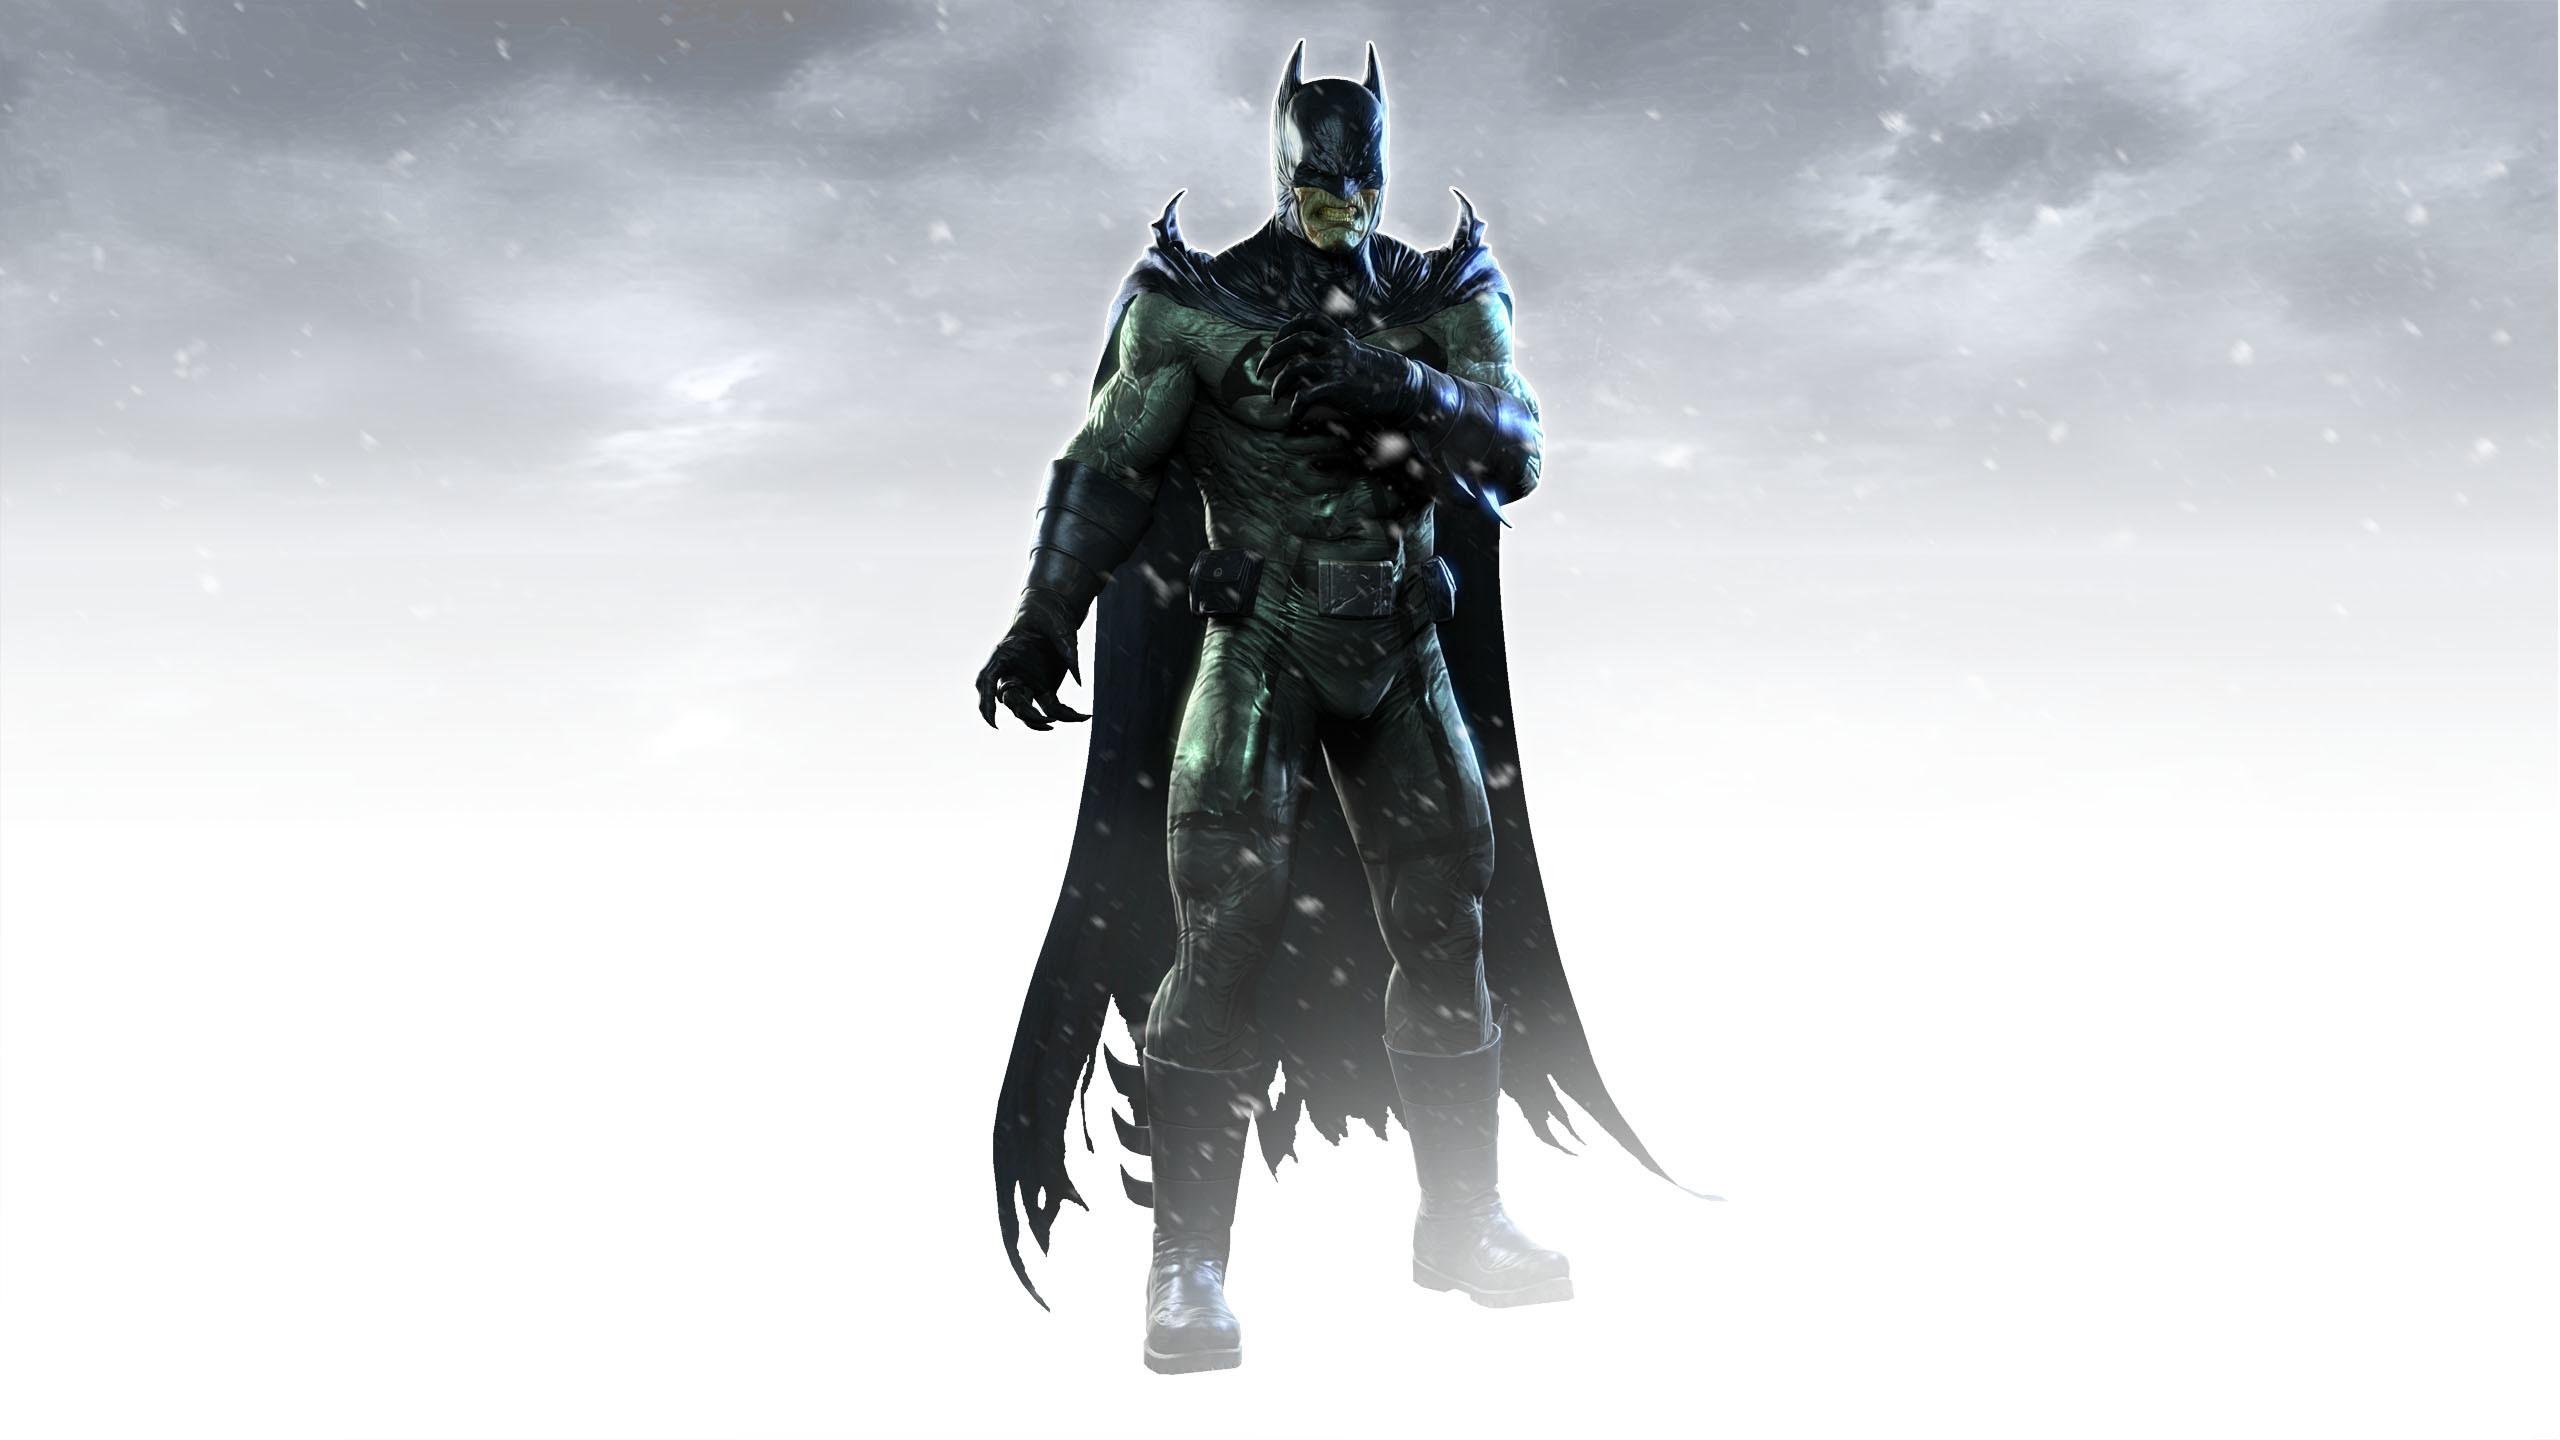 Res: 2560x1440, Blackest Night Batman. BlackestNight.jpg